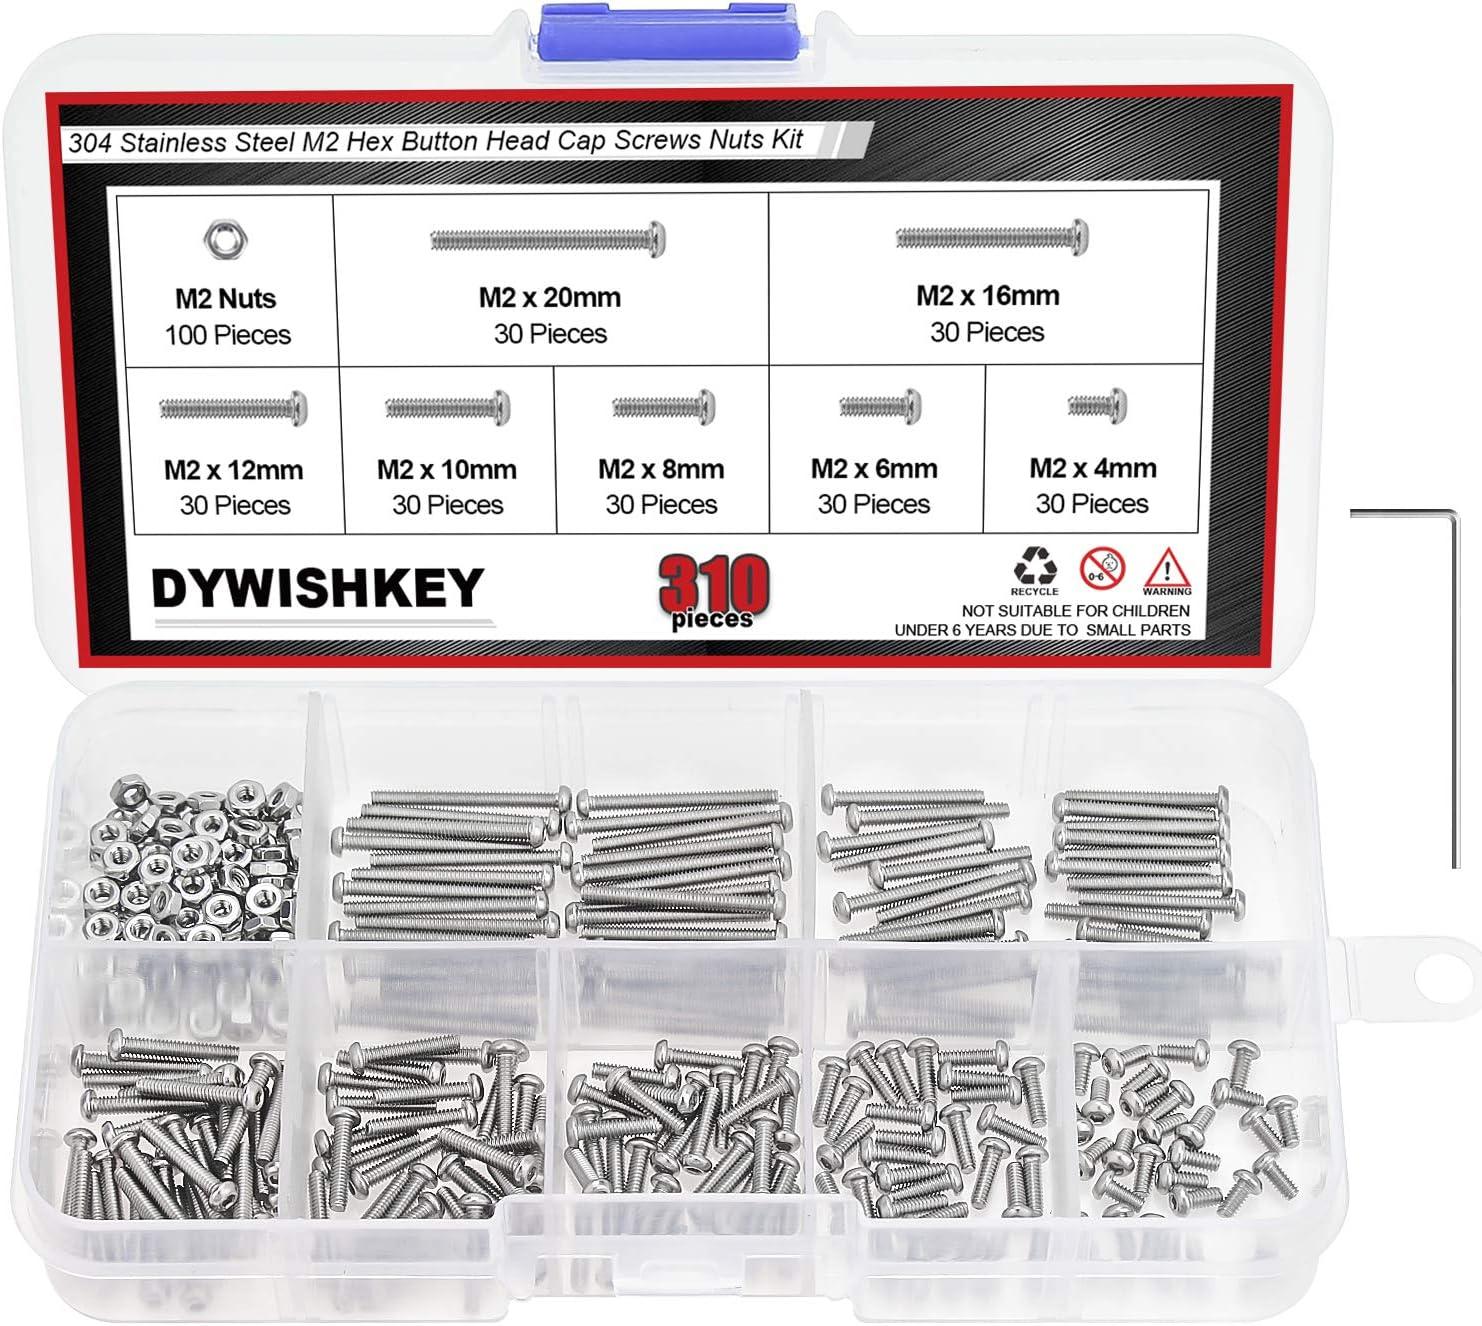 M2 Button Head Hex Socket Screws,Full Thread,Stainless Steel,100 Piece M2 x 4 mm